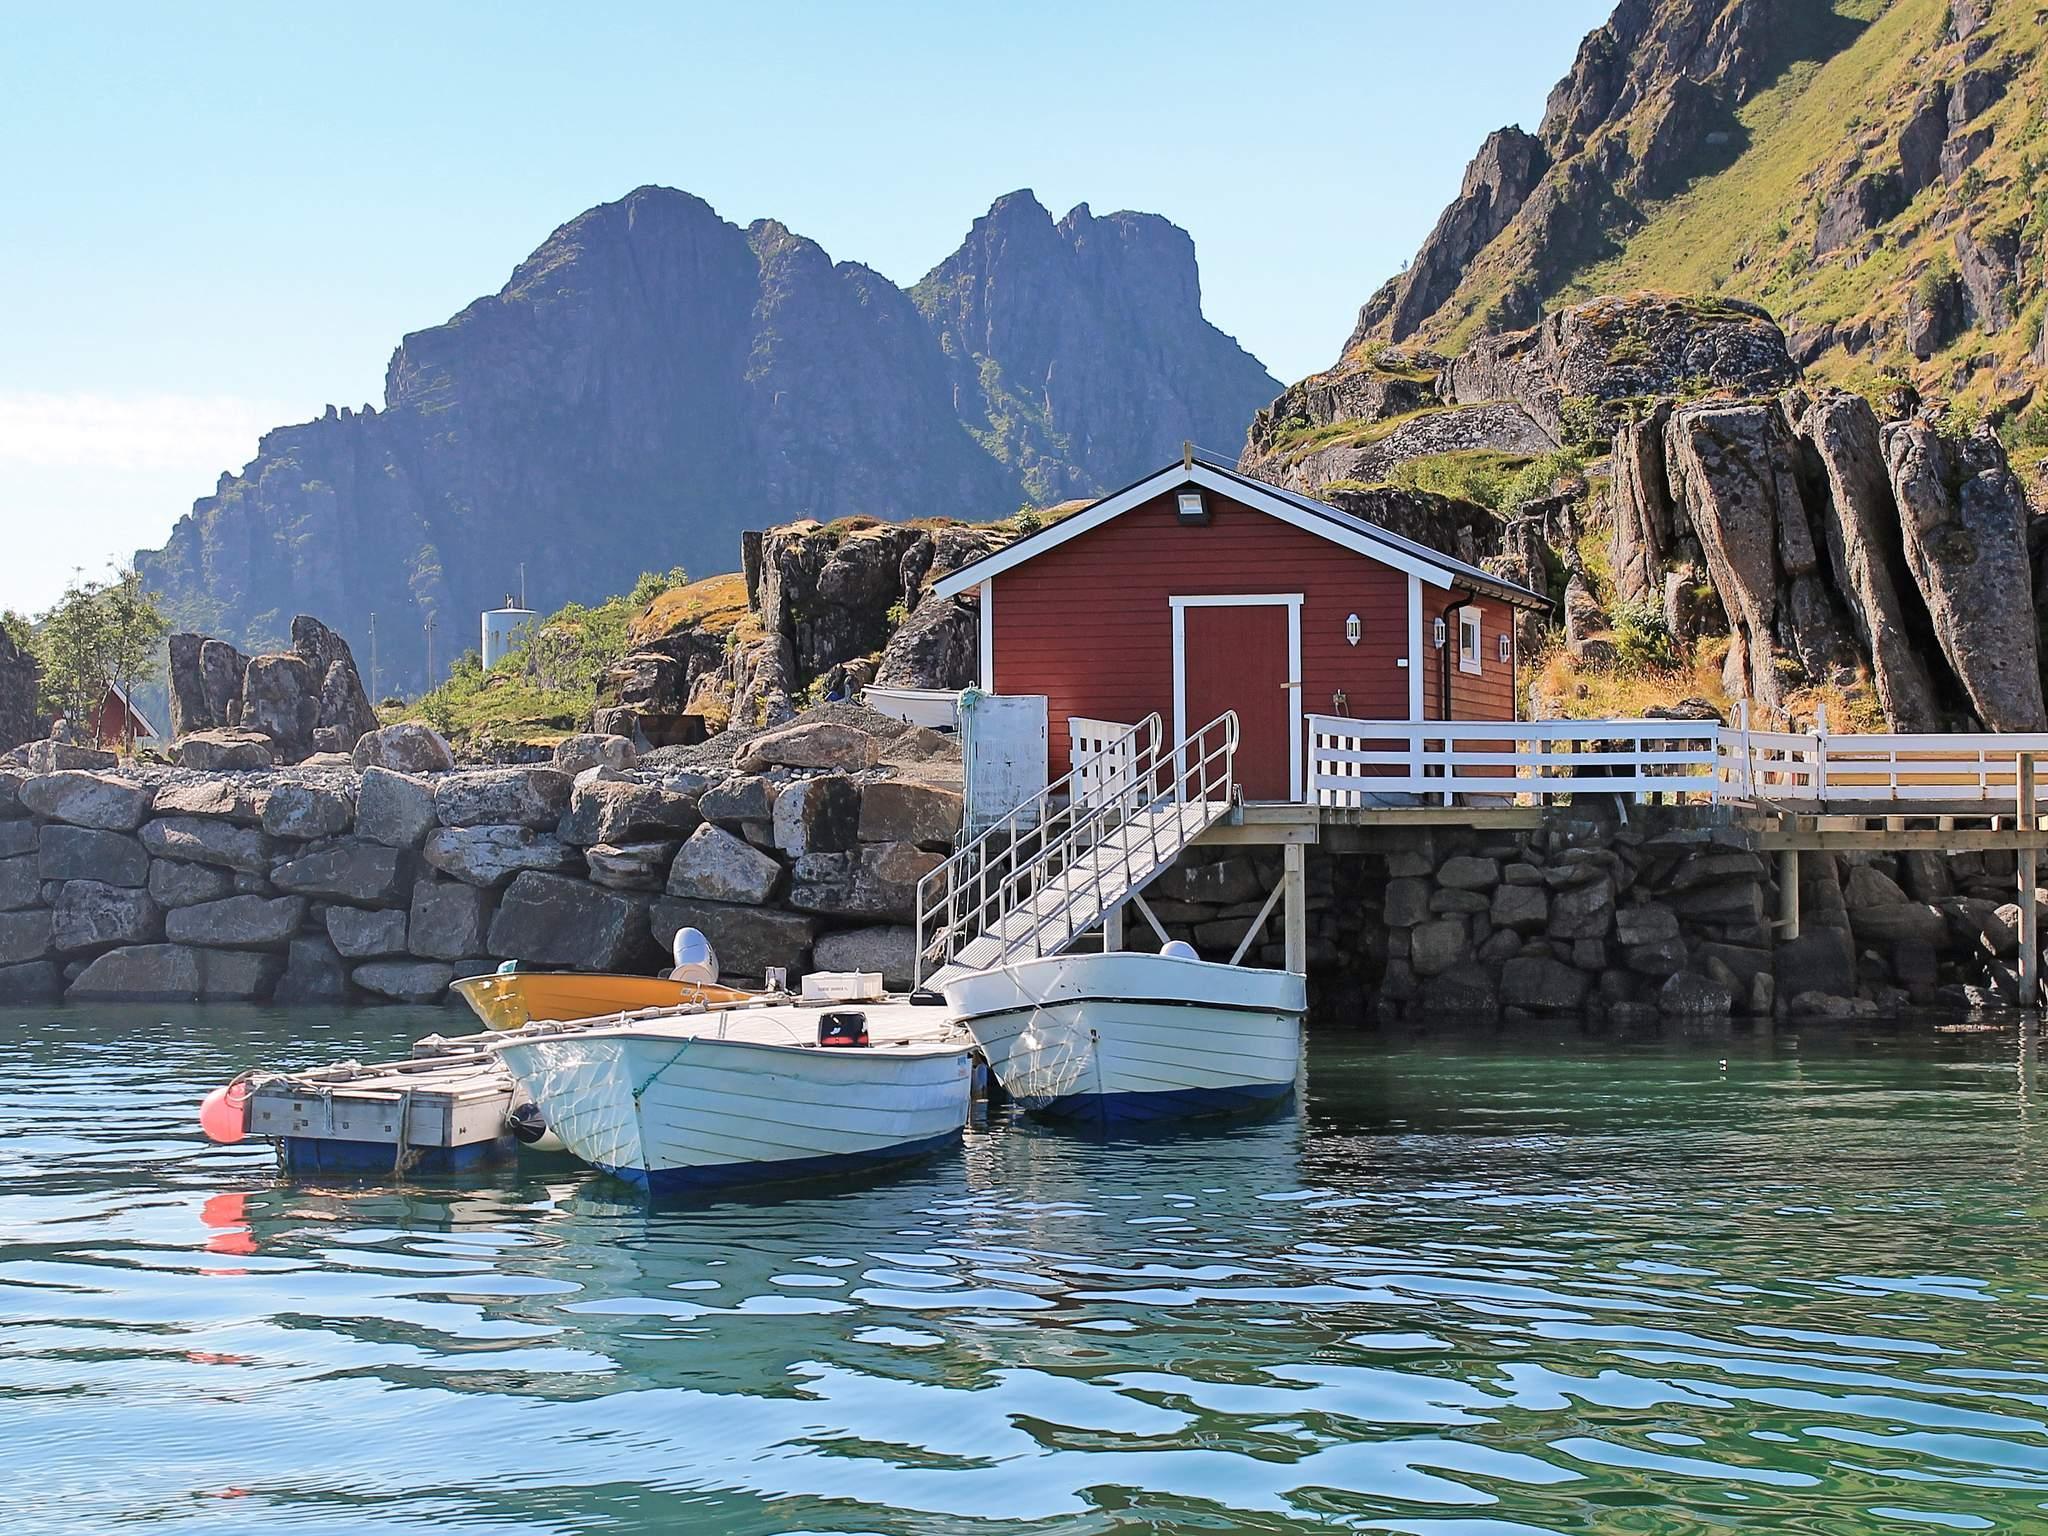 Ferienhaus Lofoten (439553), Sennesvik, , Nordnorwegen, Norwegen, Bild 15